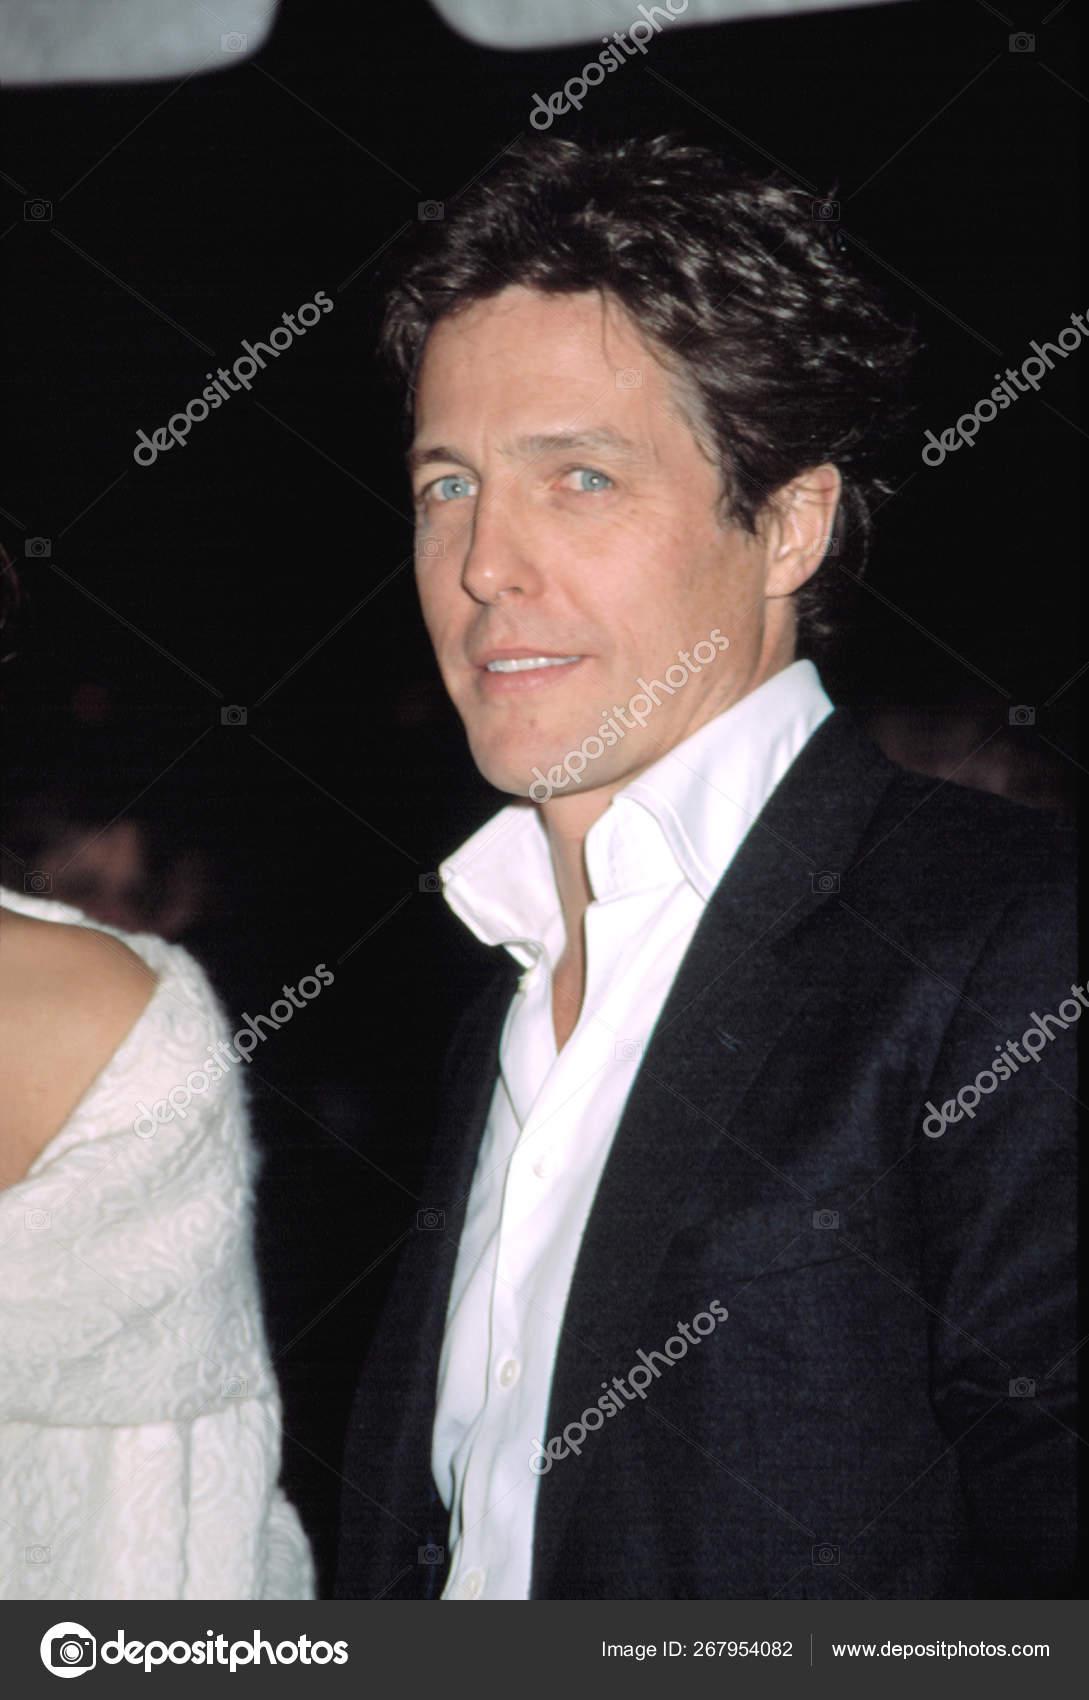 Hugh Grant Premiere Two Weeks Notice 2002 Stock Editorial Photo C Everett225 267954082